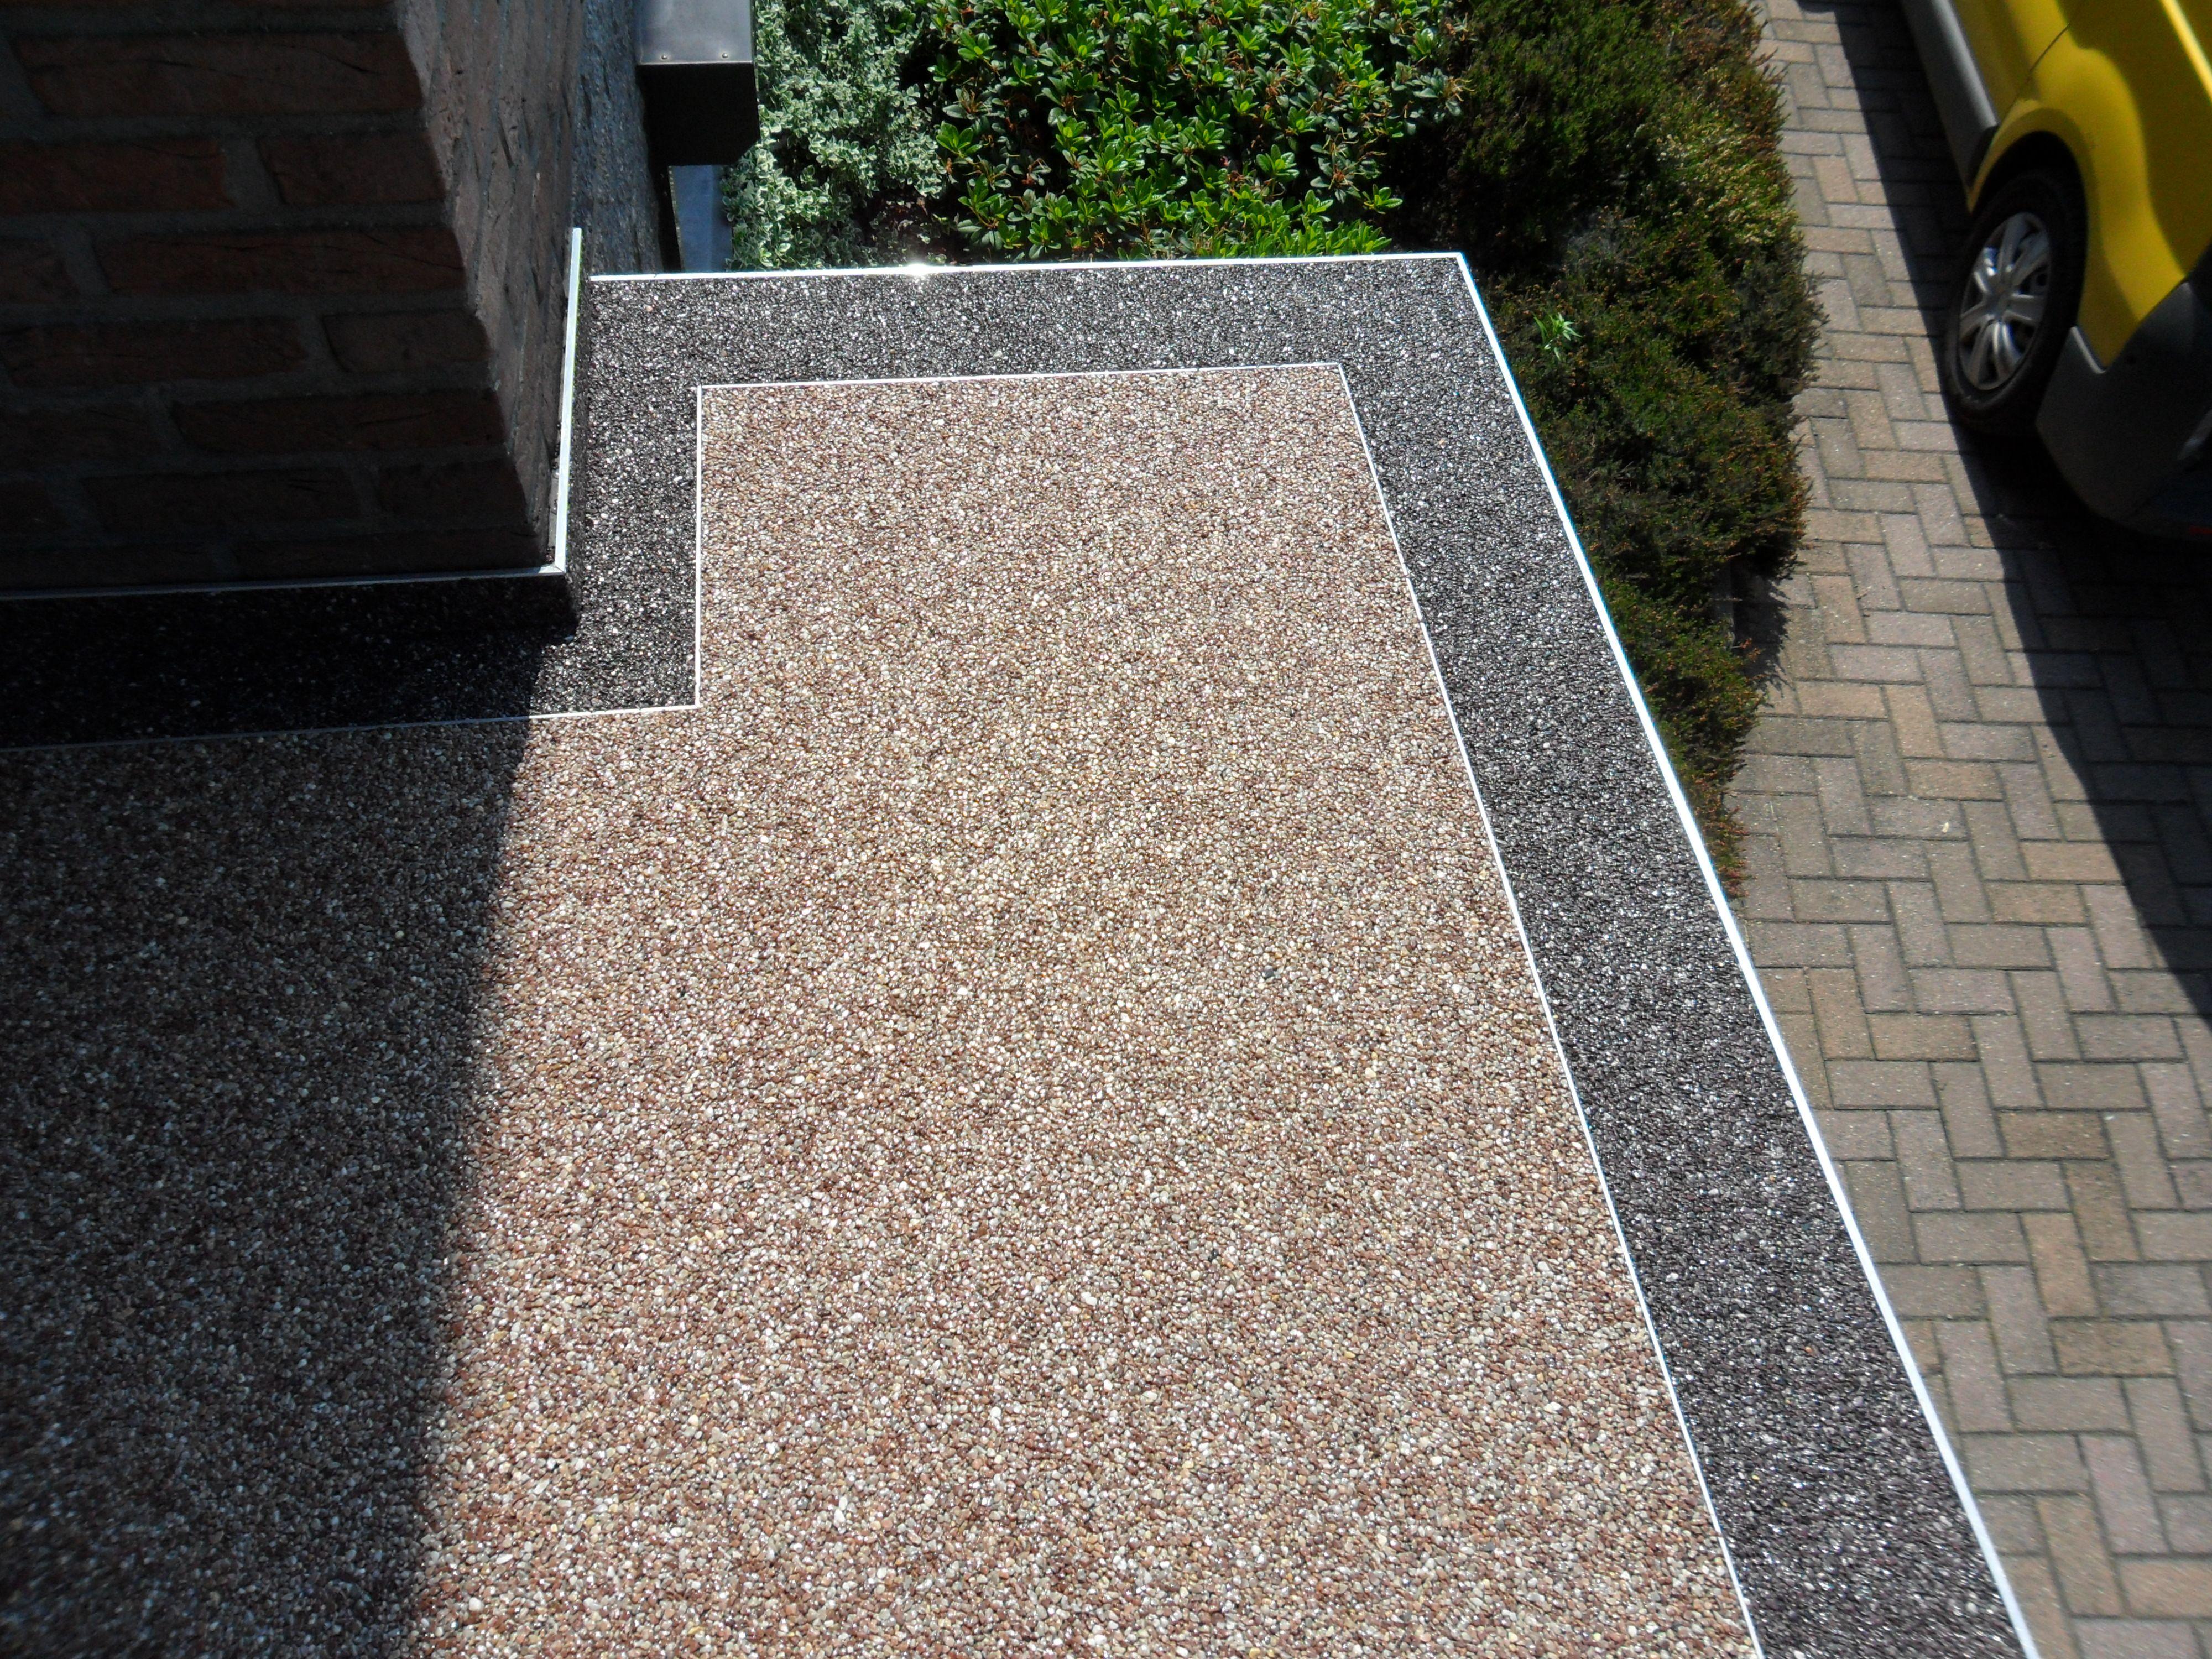 Steinteppich Als Terrassen Balkonboden Balkonboden Bodenbelag Terrasse Aussentreppe Fliesen